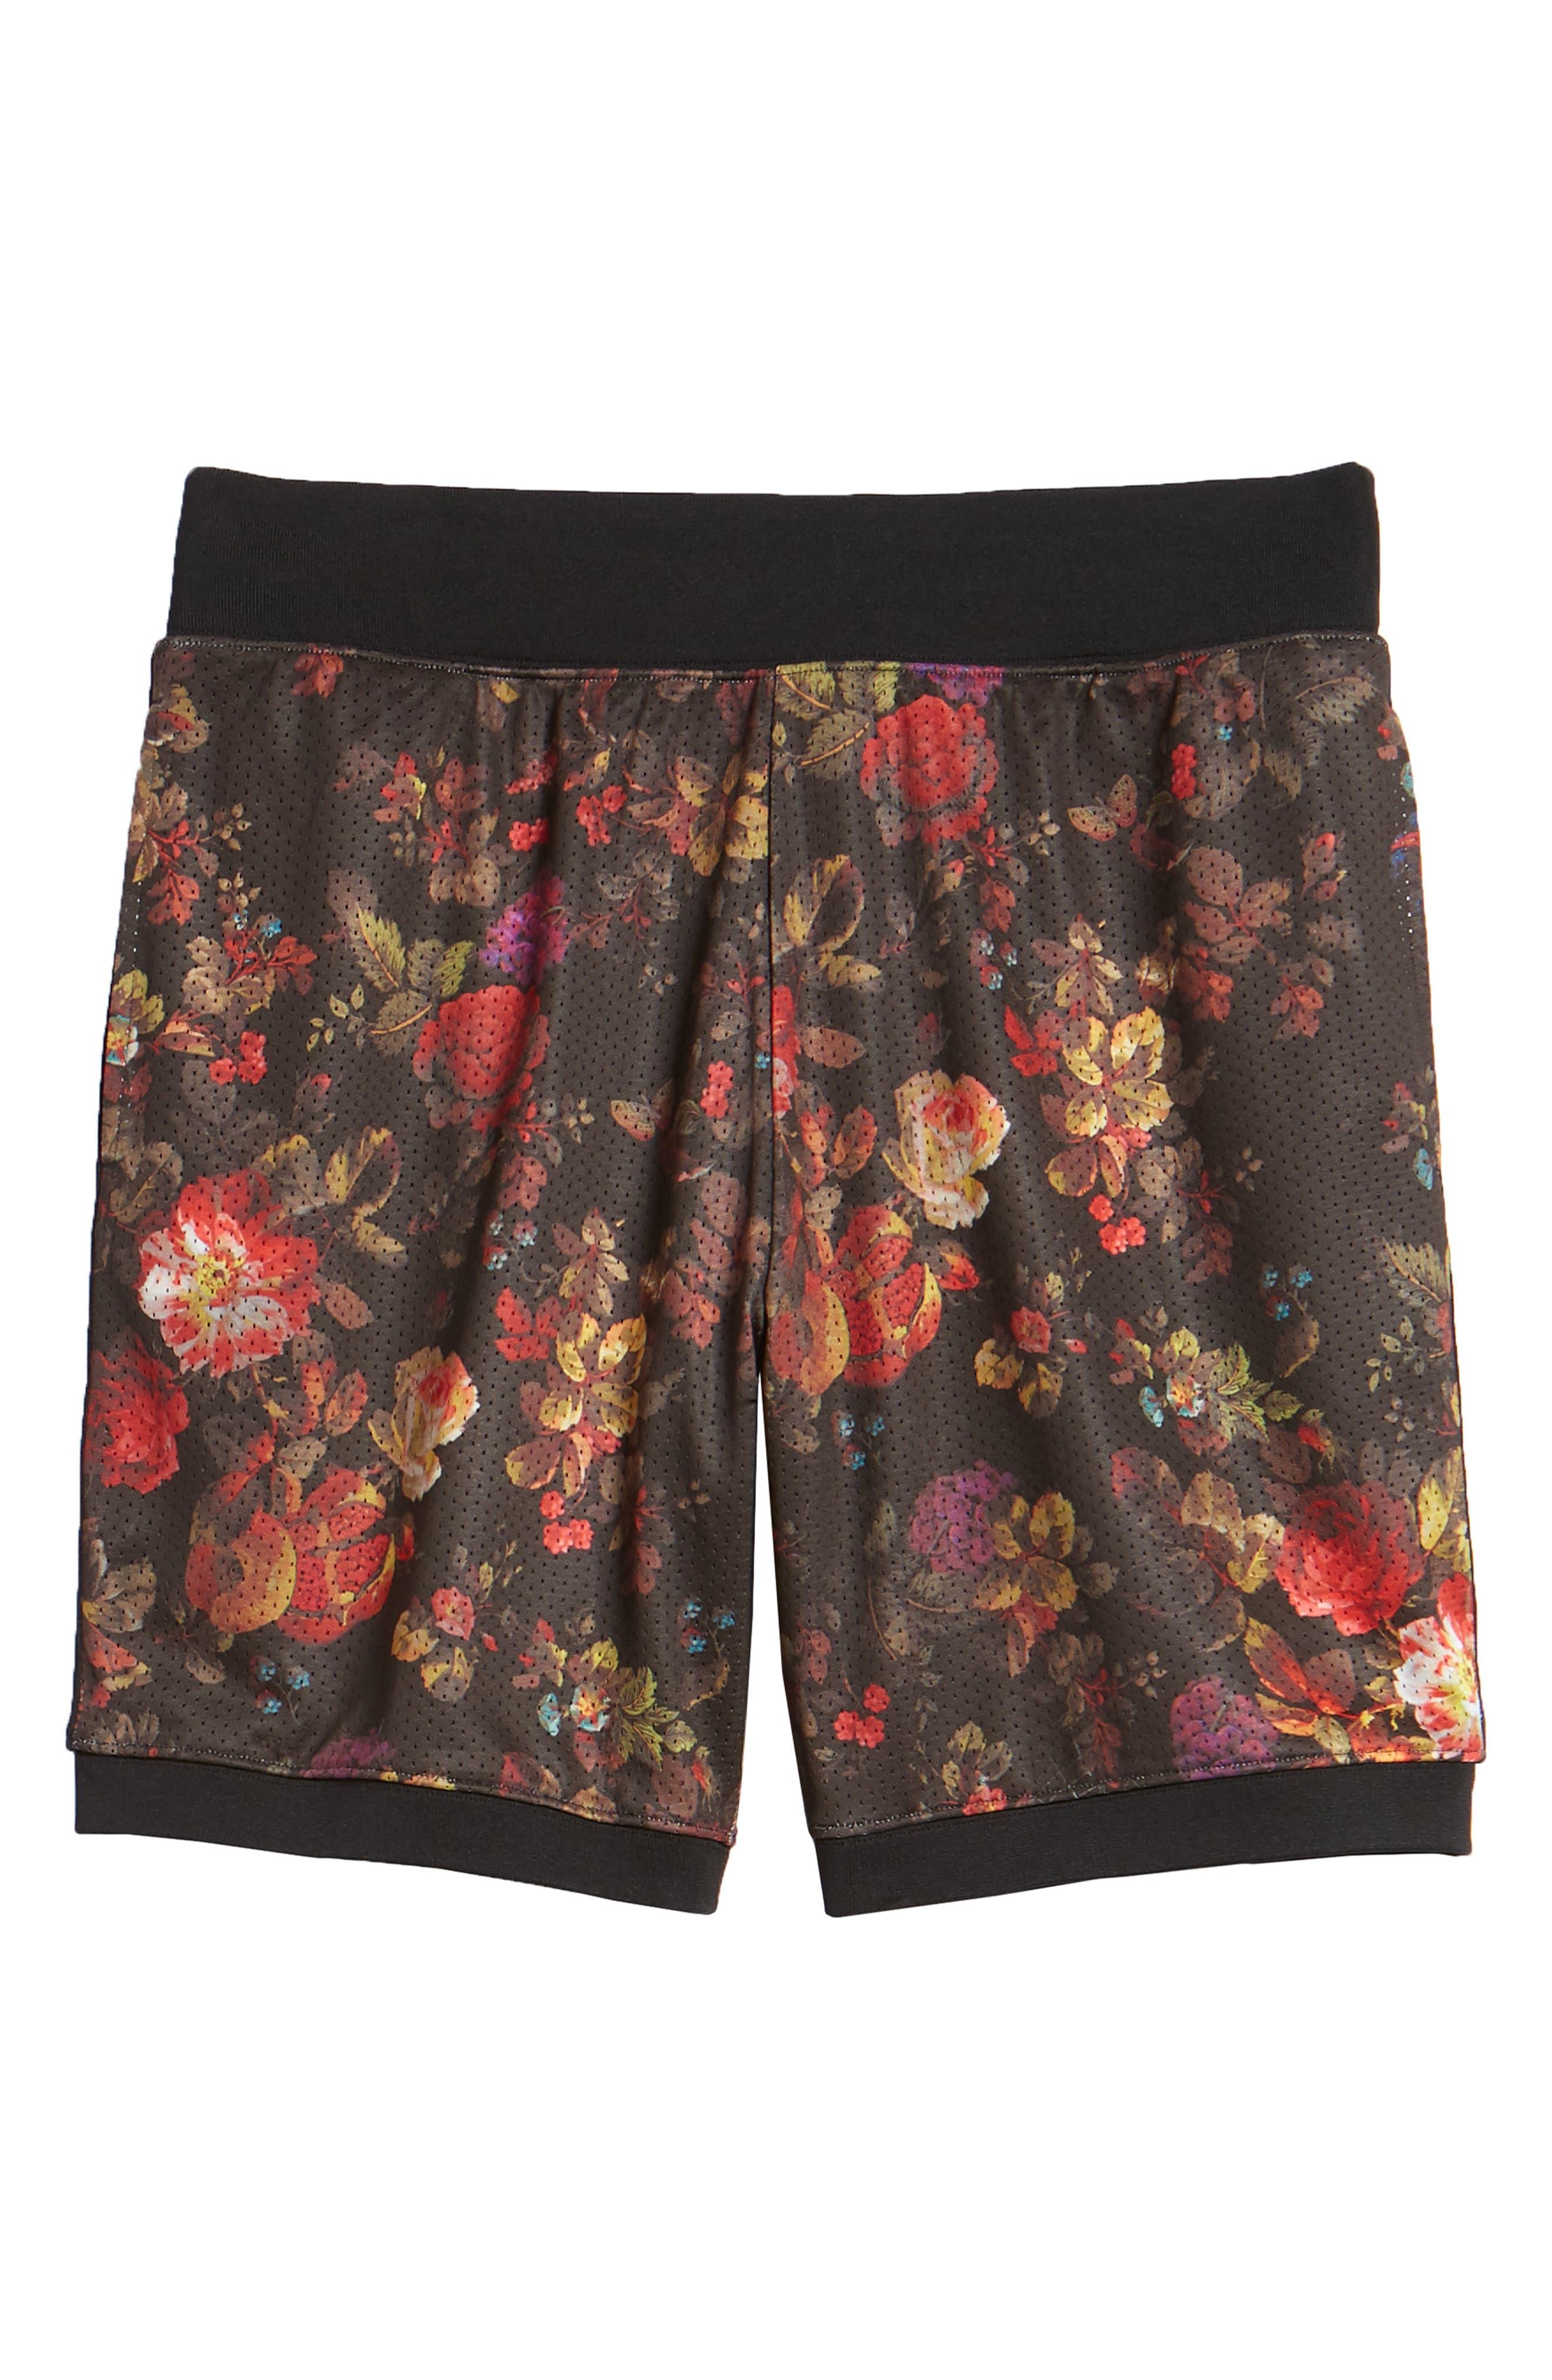 Dry Floral Shorts,                             Alternate thumbnail 6, color,                             BLACK/ WHITE